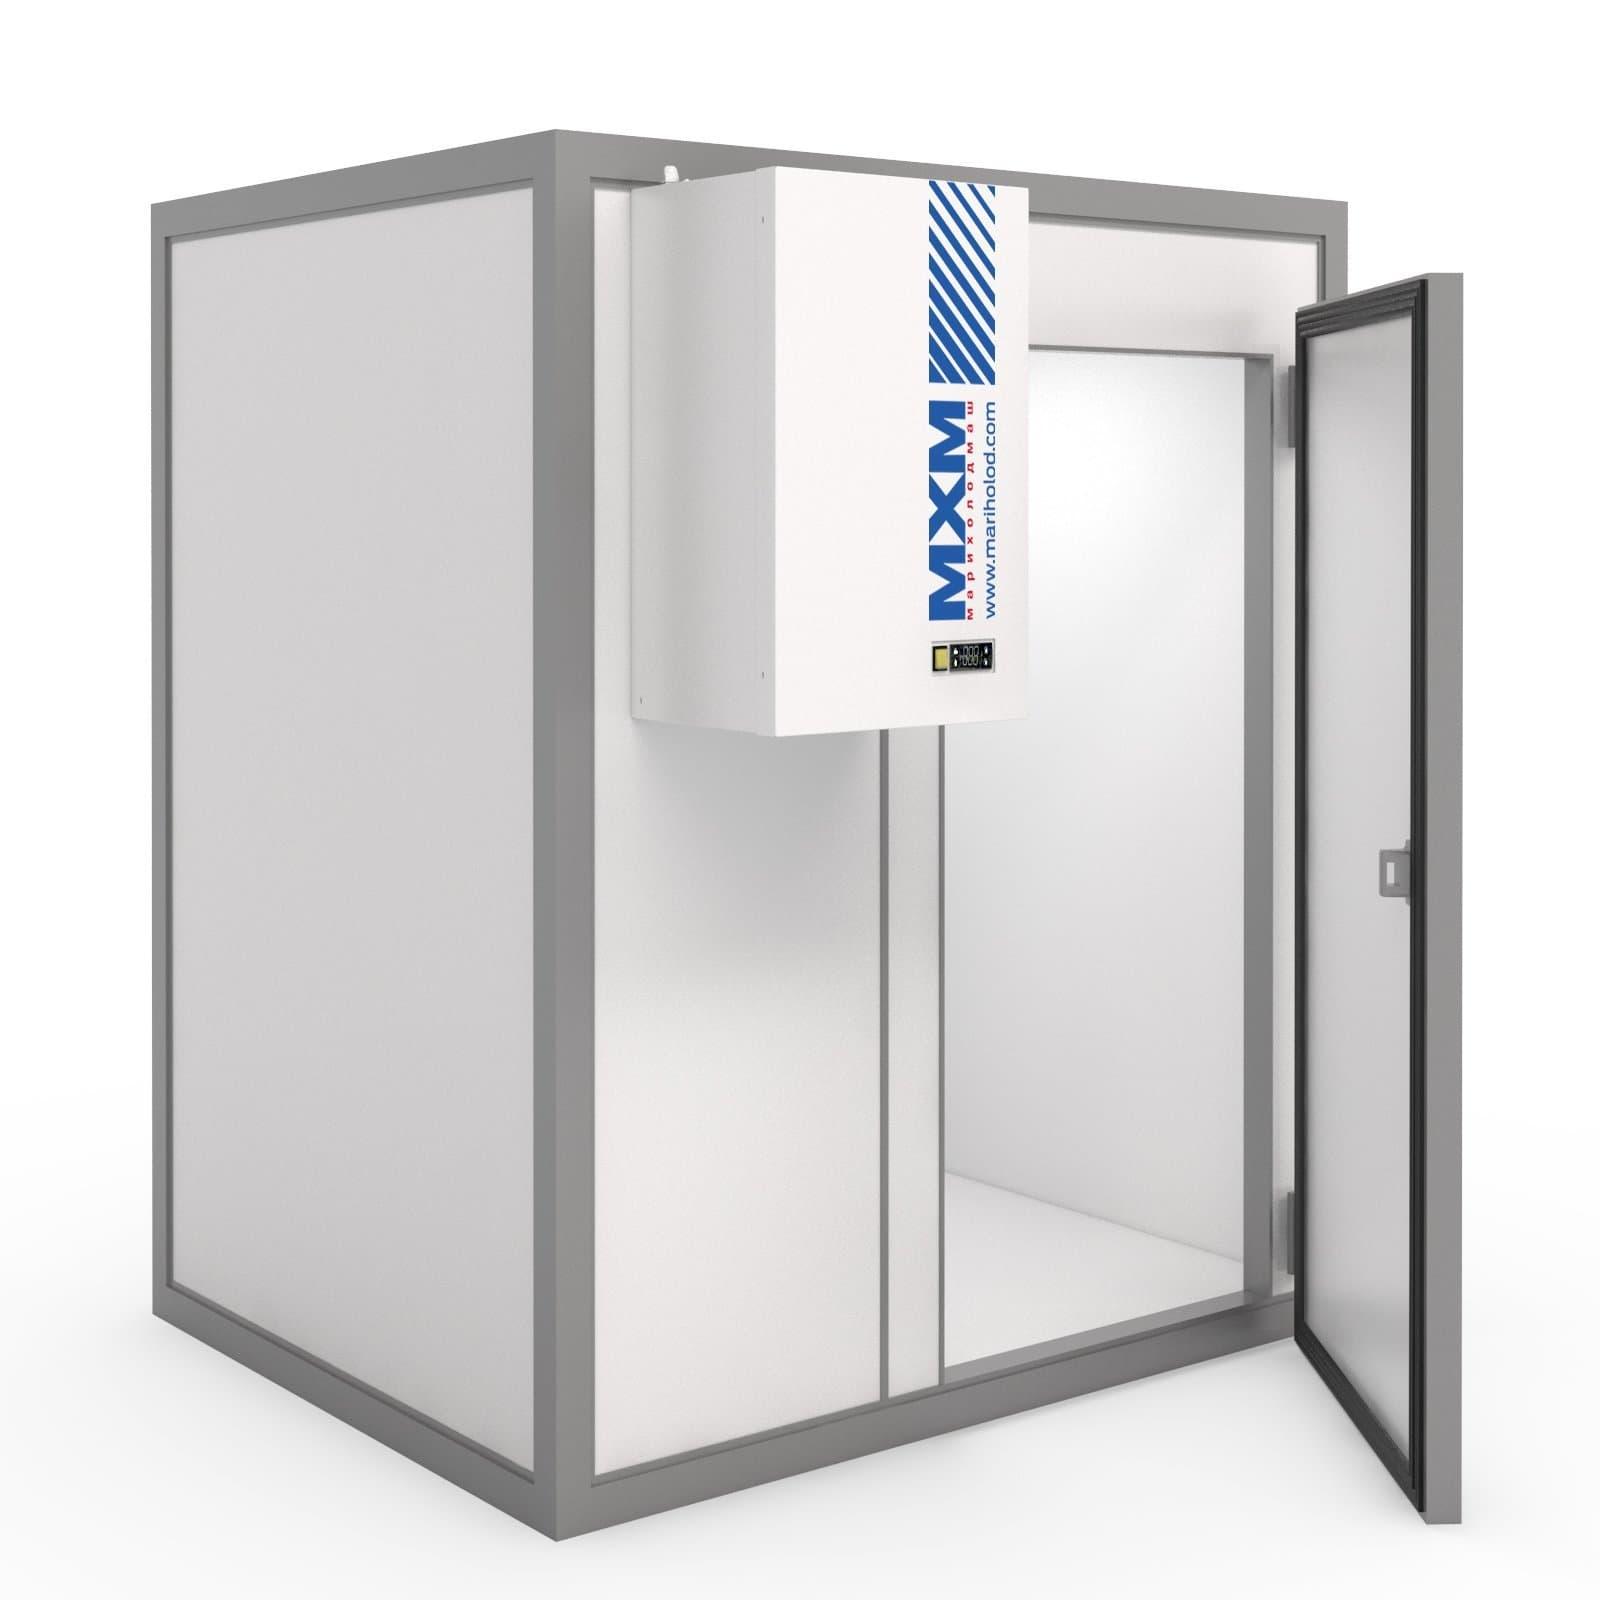 Камера холодильная МХМ КХН-52,79 1660×15460×2460